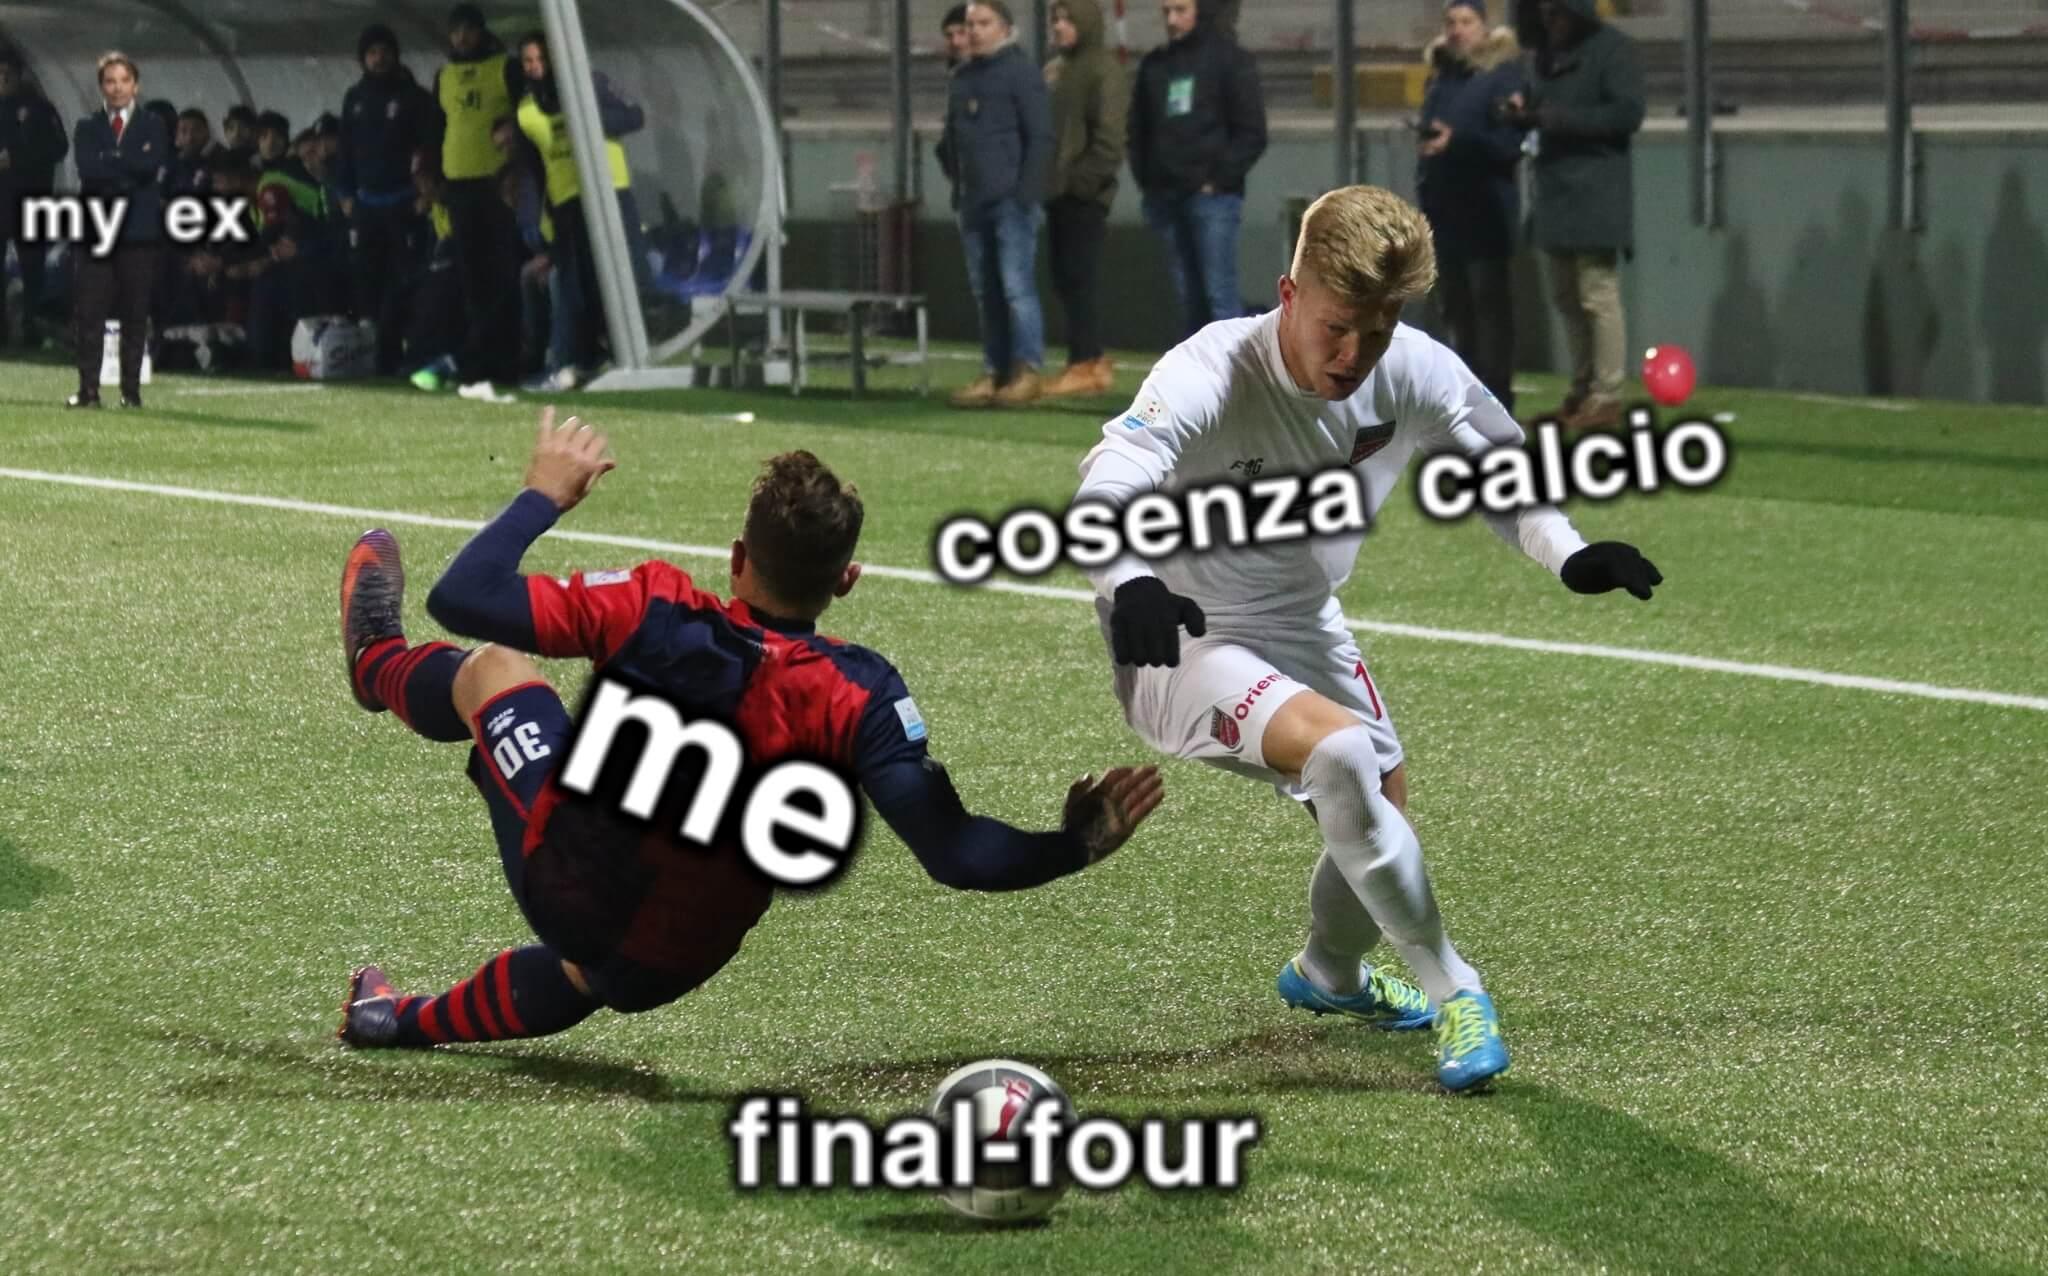 Samb-Cosenza (1)